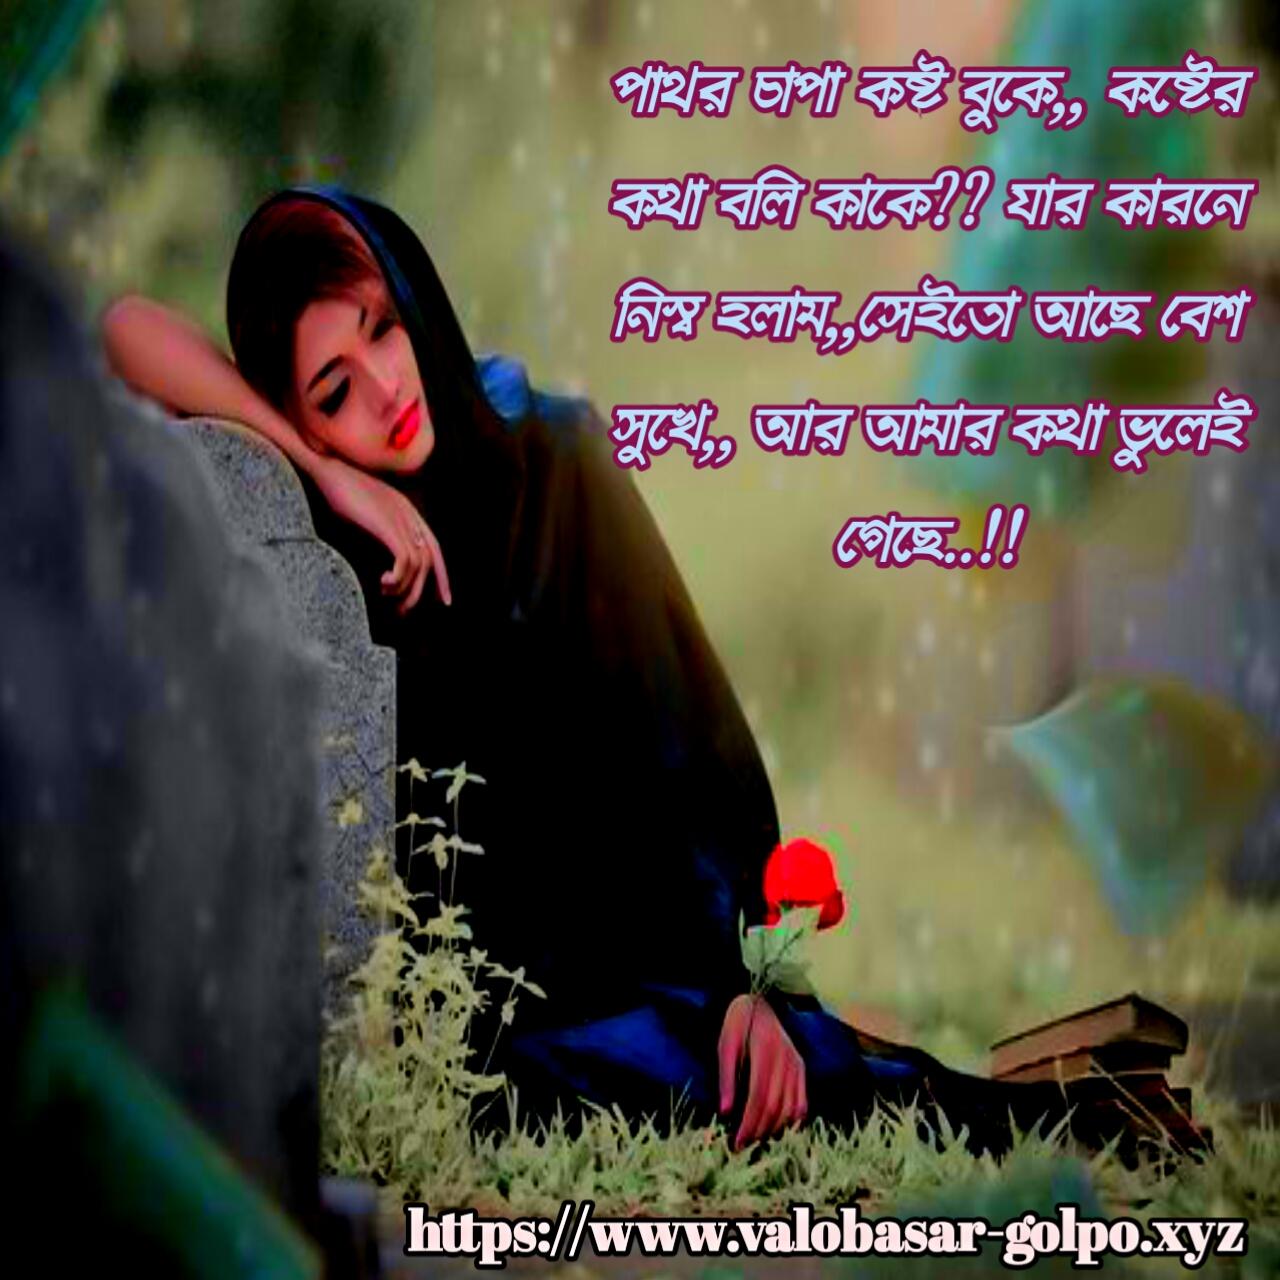 Bangla Koster Picture ,valobashar Koster Photo ,bengali - Girl - HD Wallpaper